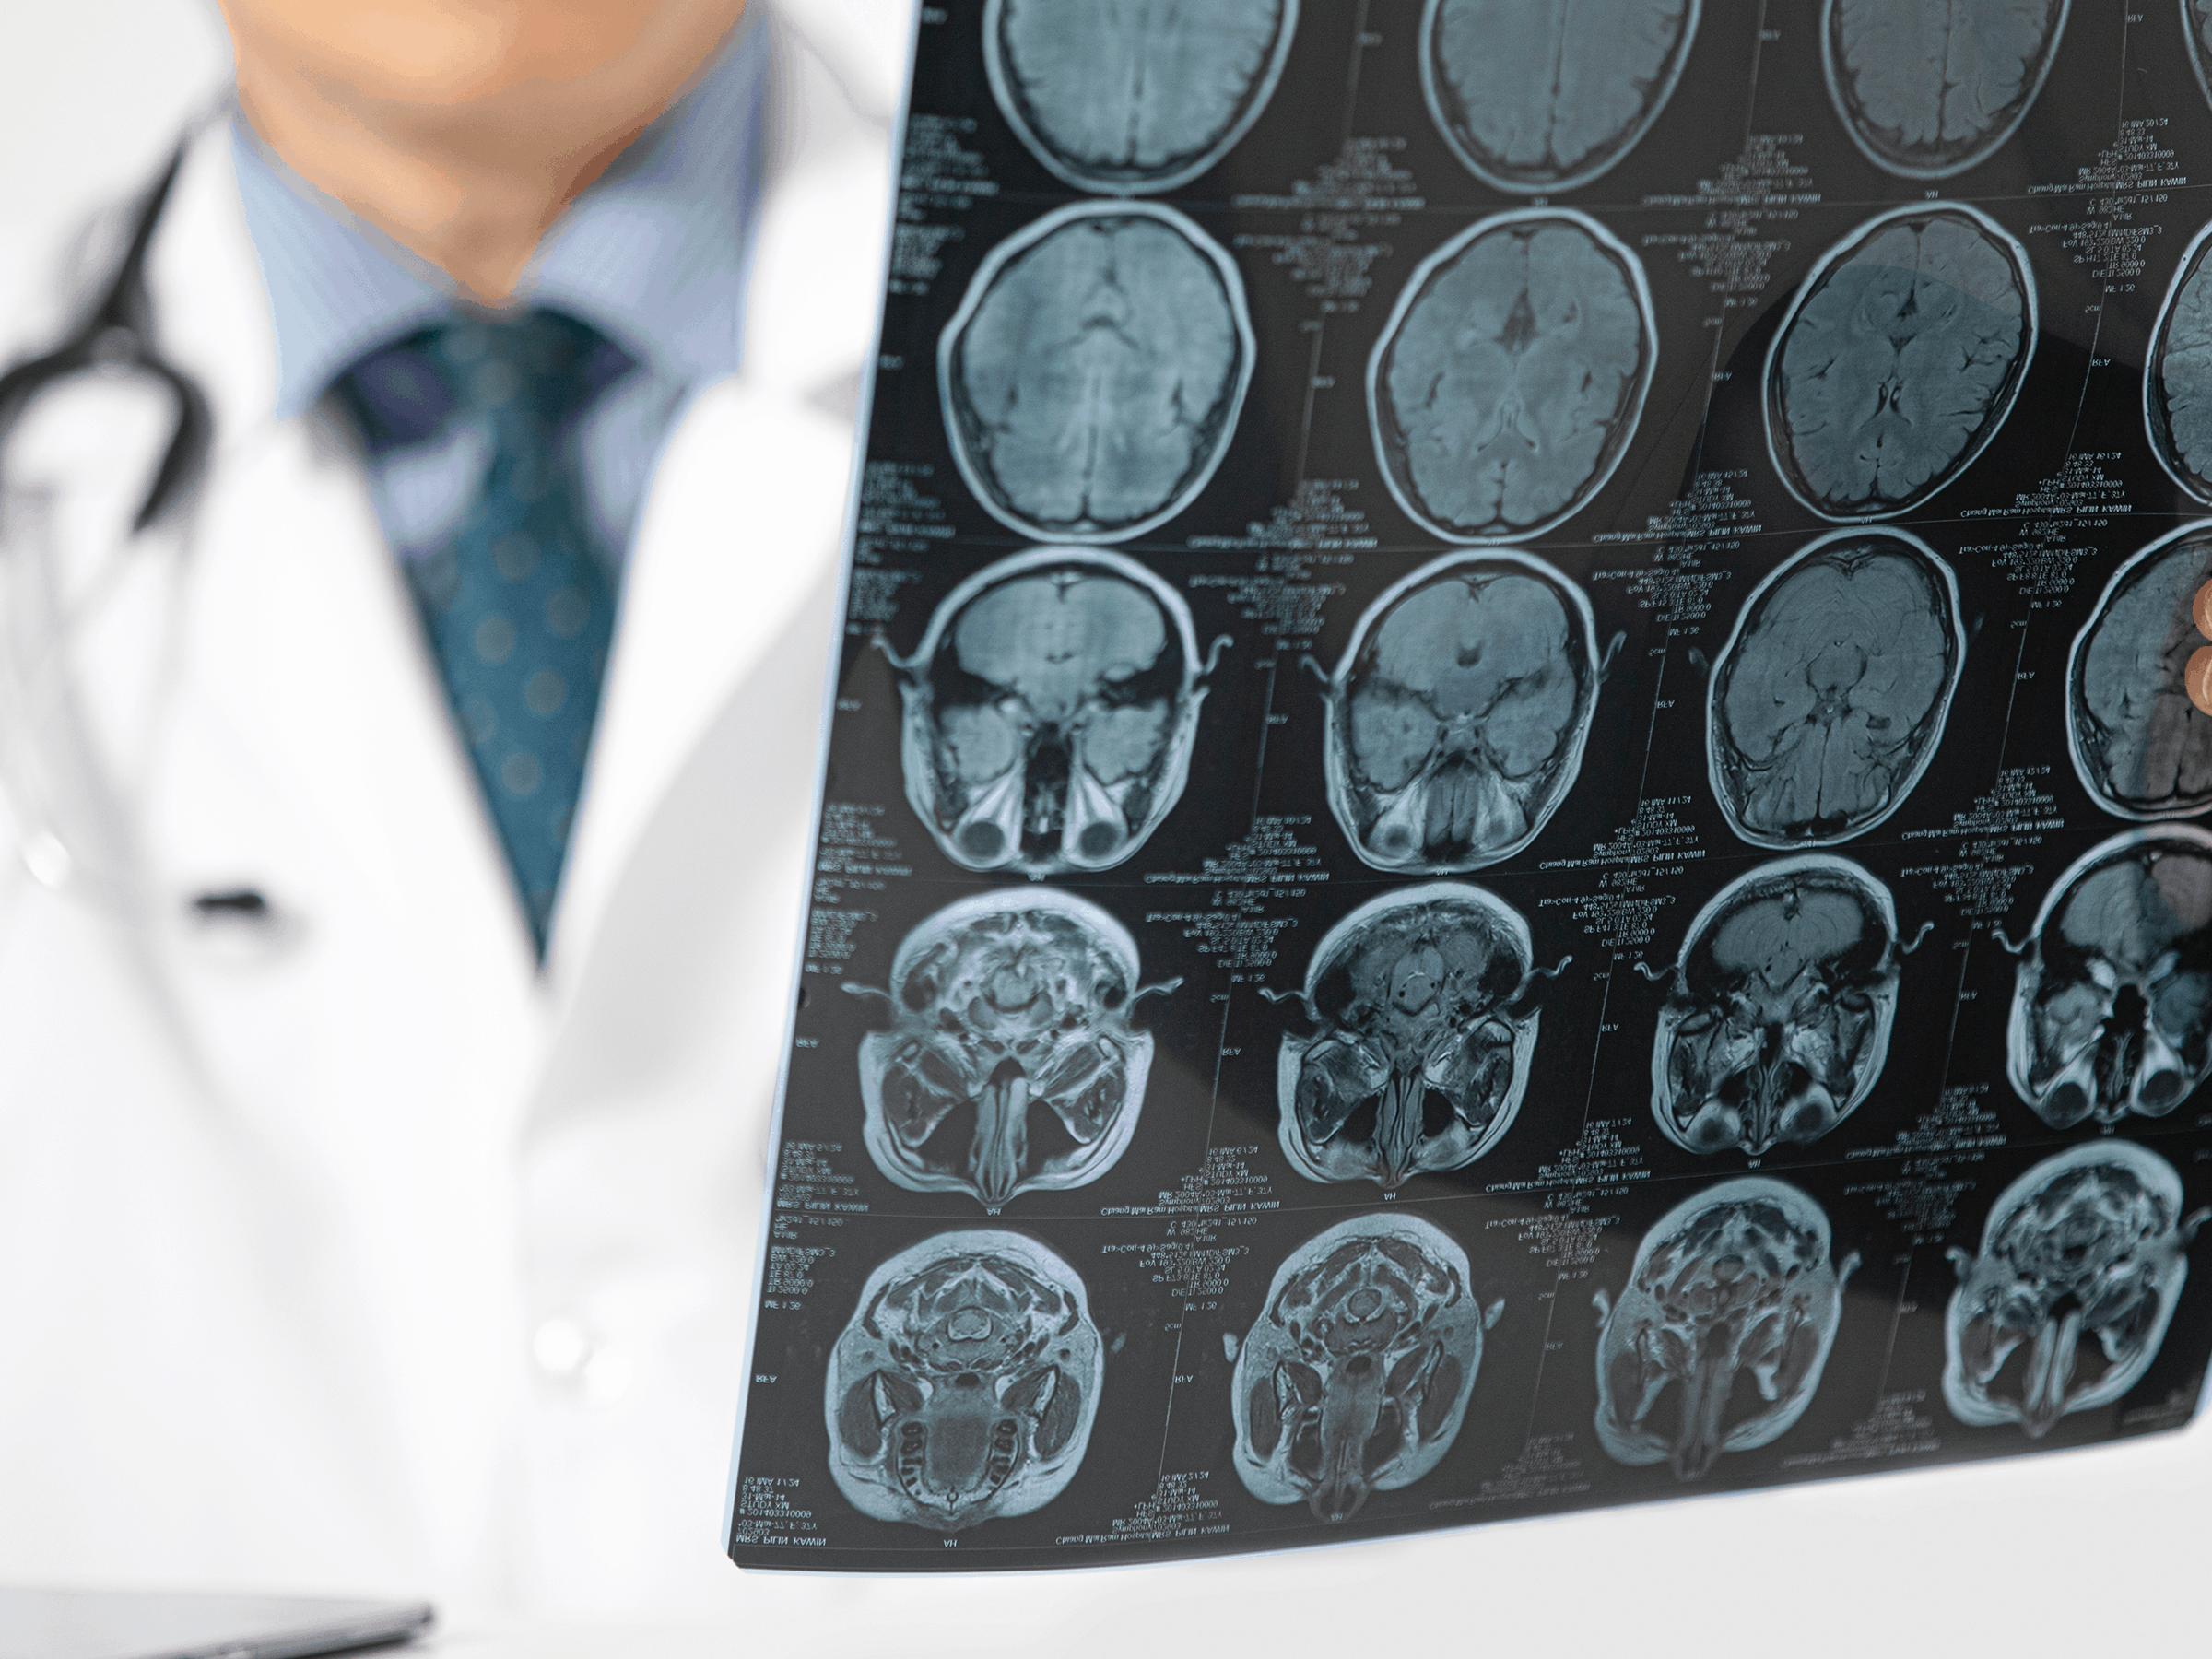 Neurosurgeon examines brain scans before advising any neurosurgery procedures